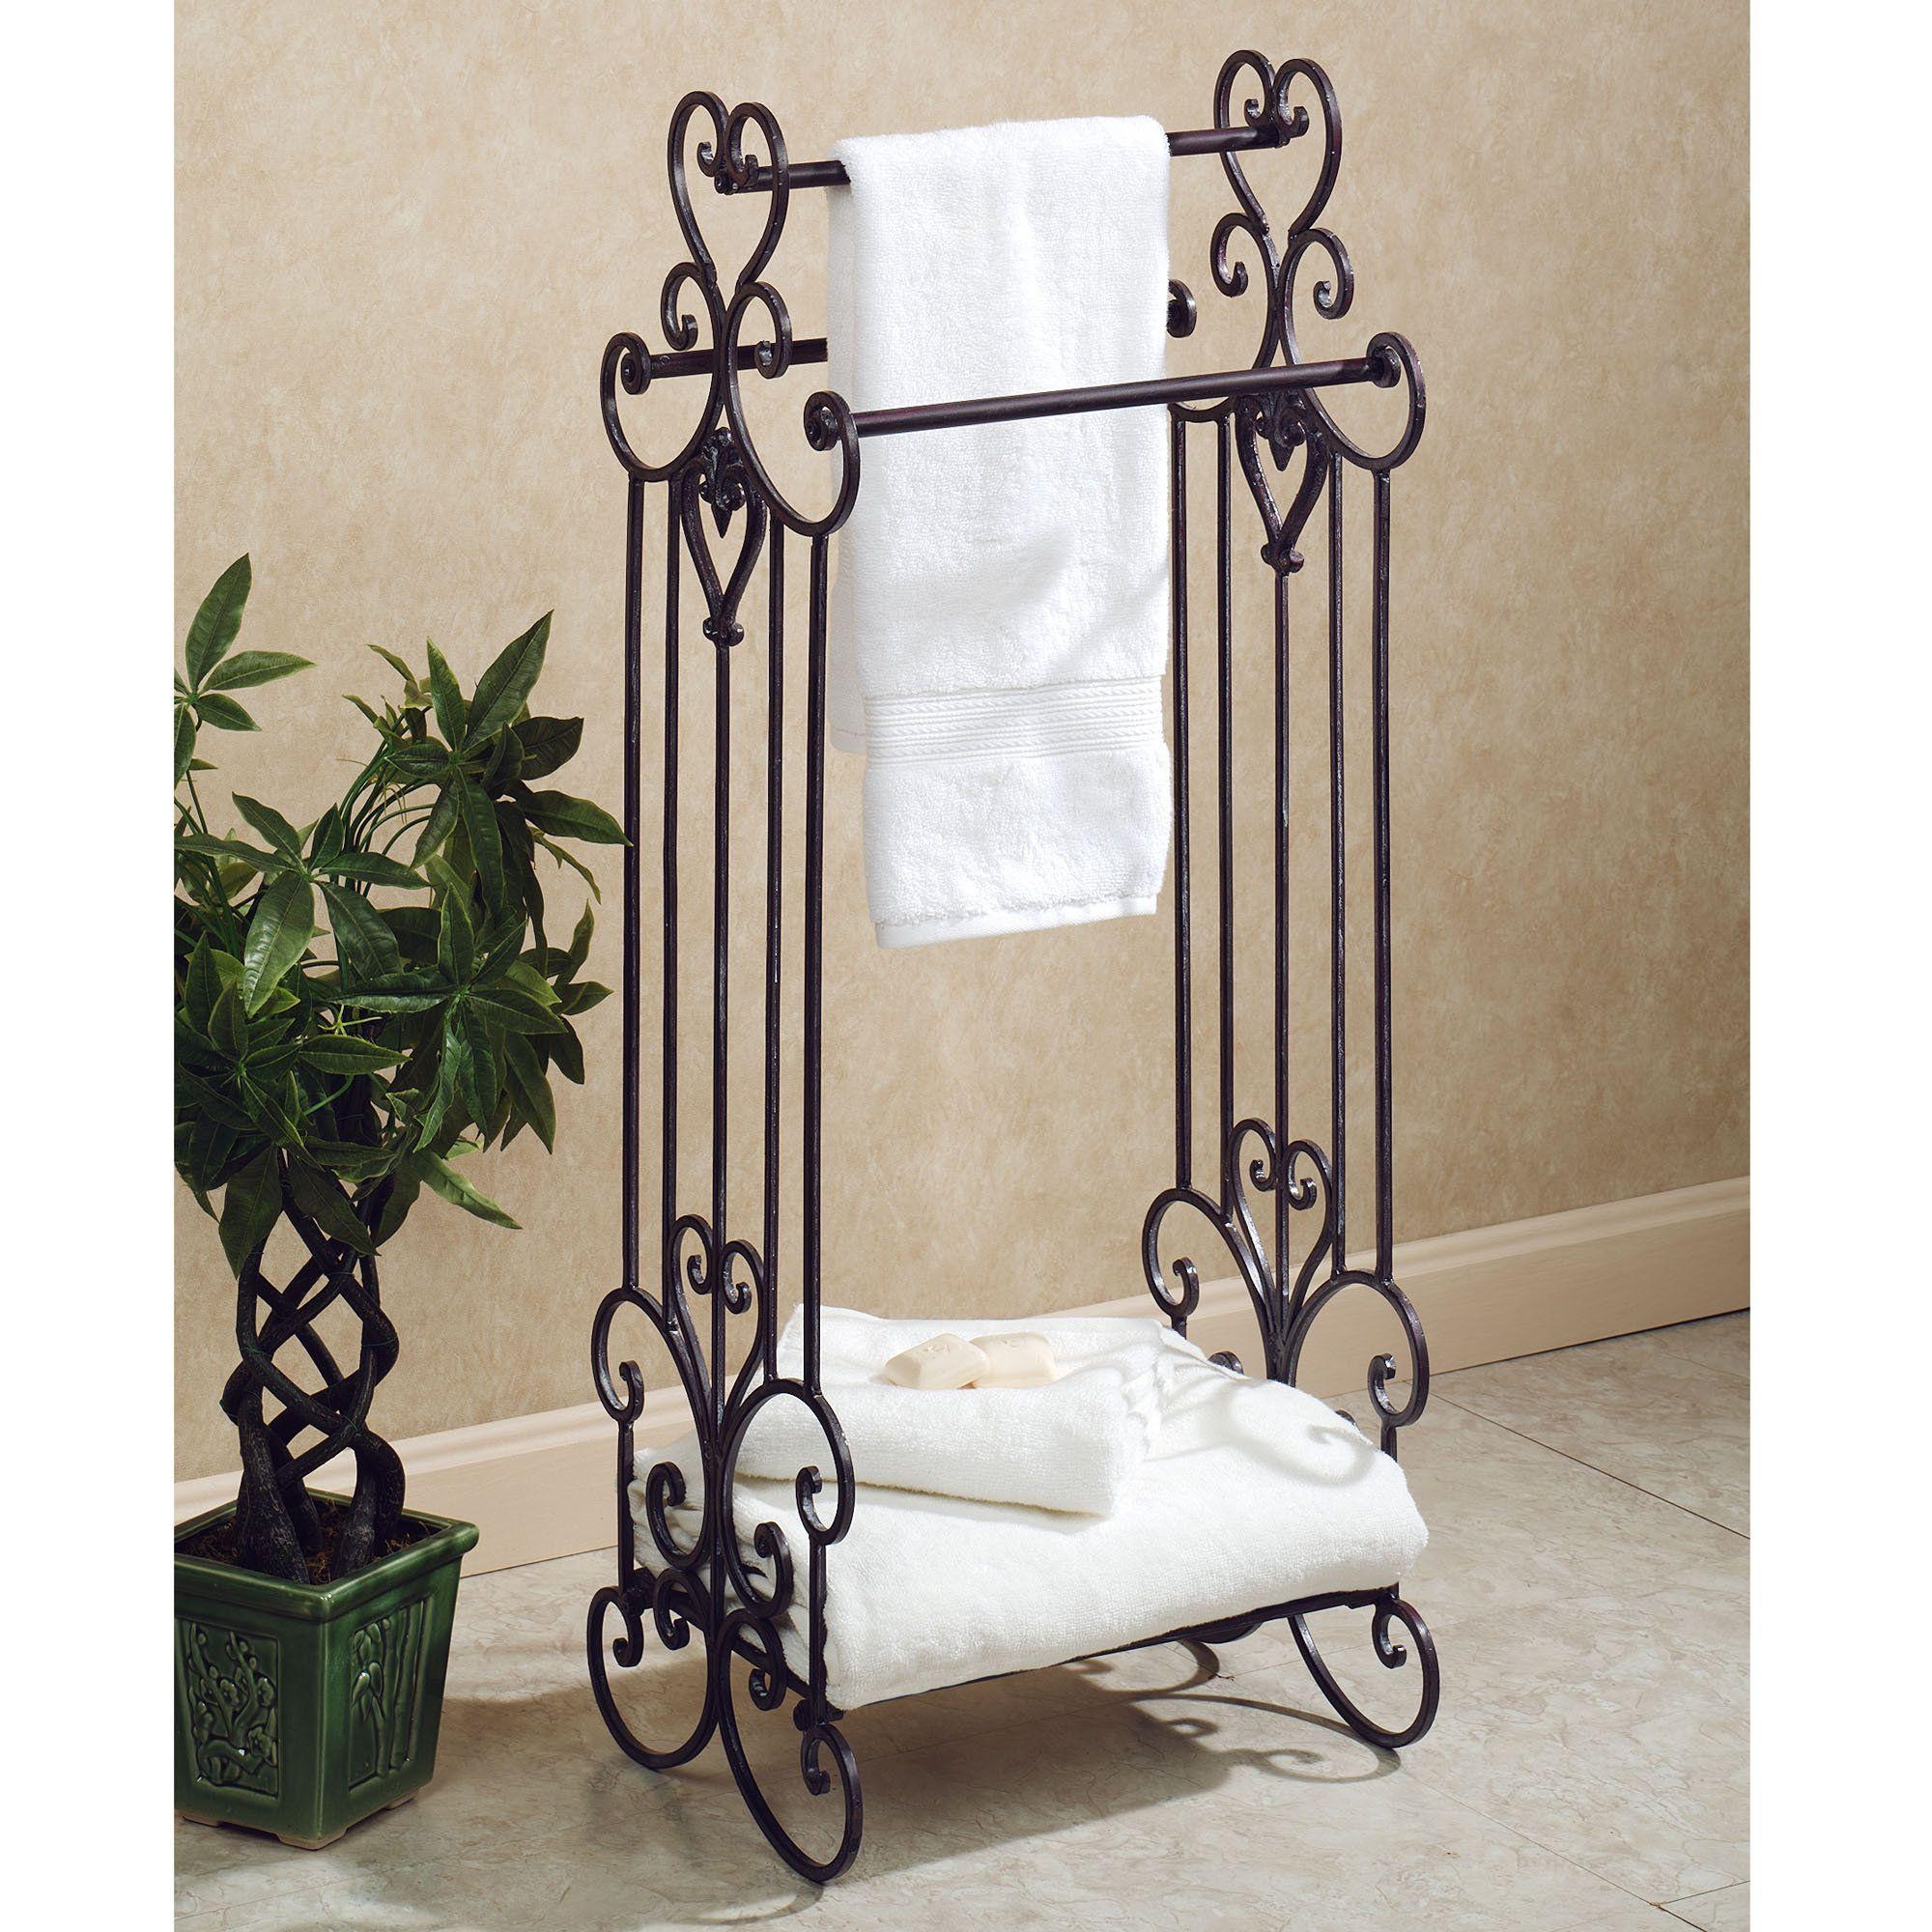 Aldabella Tuscan Slate Bath Towel Rack Stand Free Standing Towel Rack Towel Holder Bathroom Bath Towel Racks